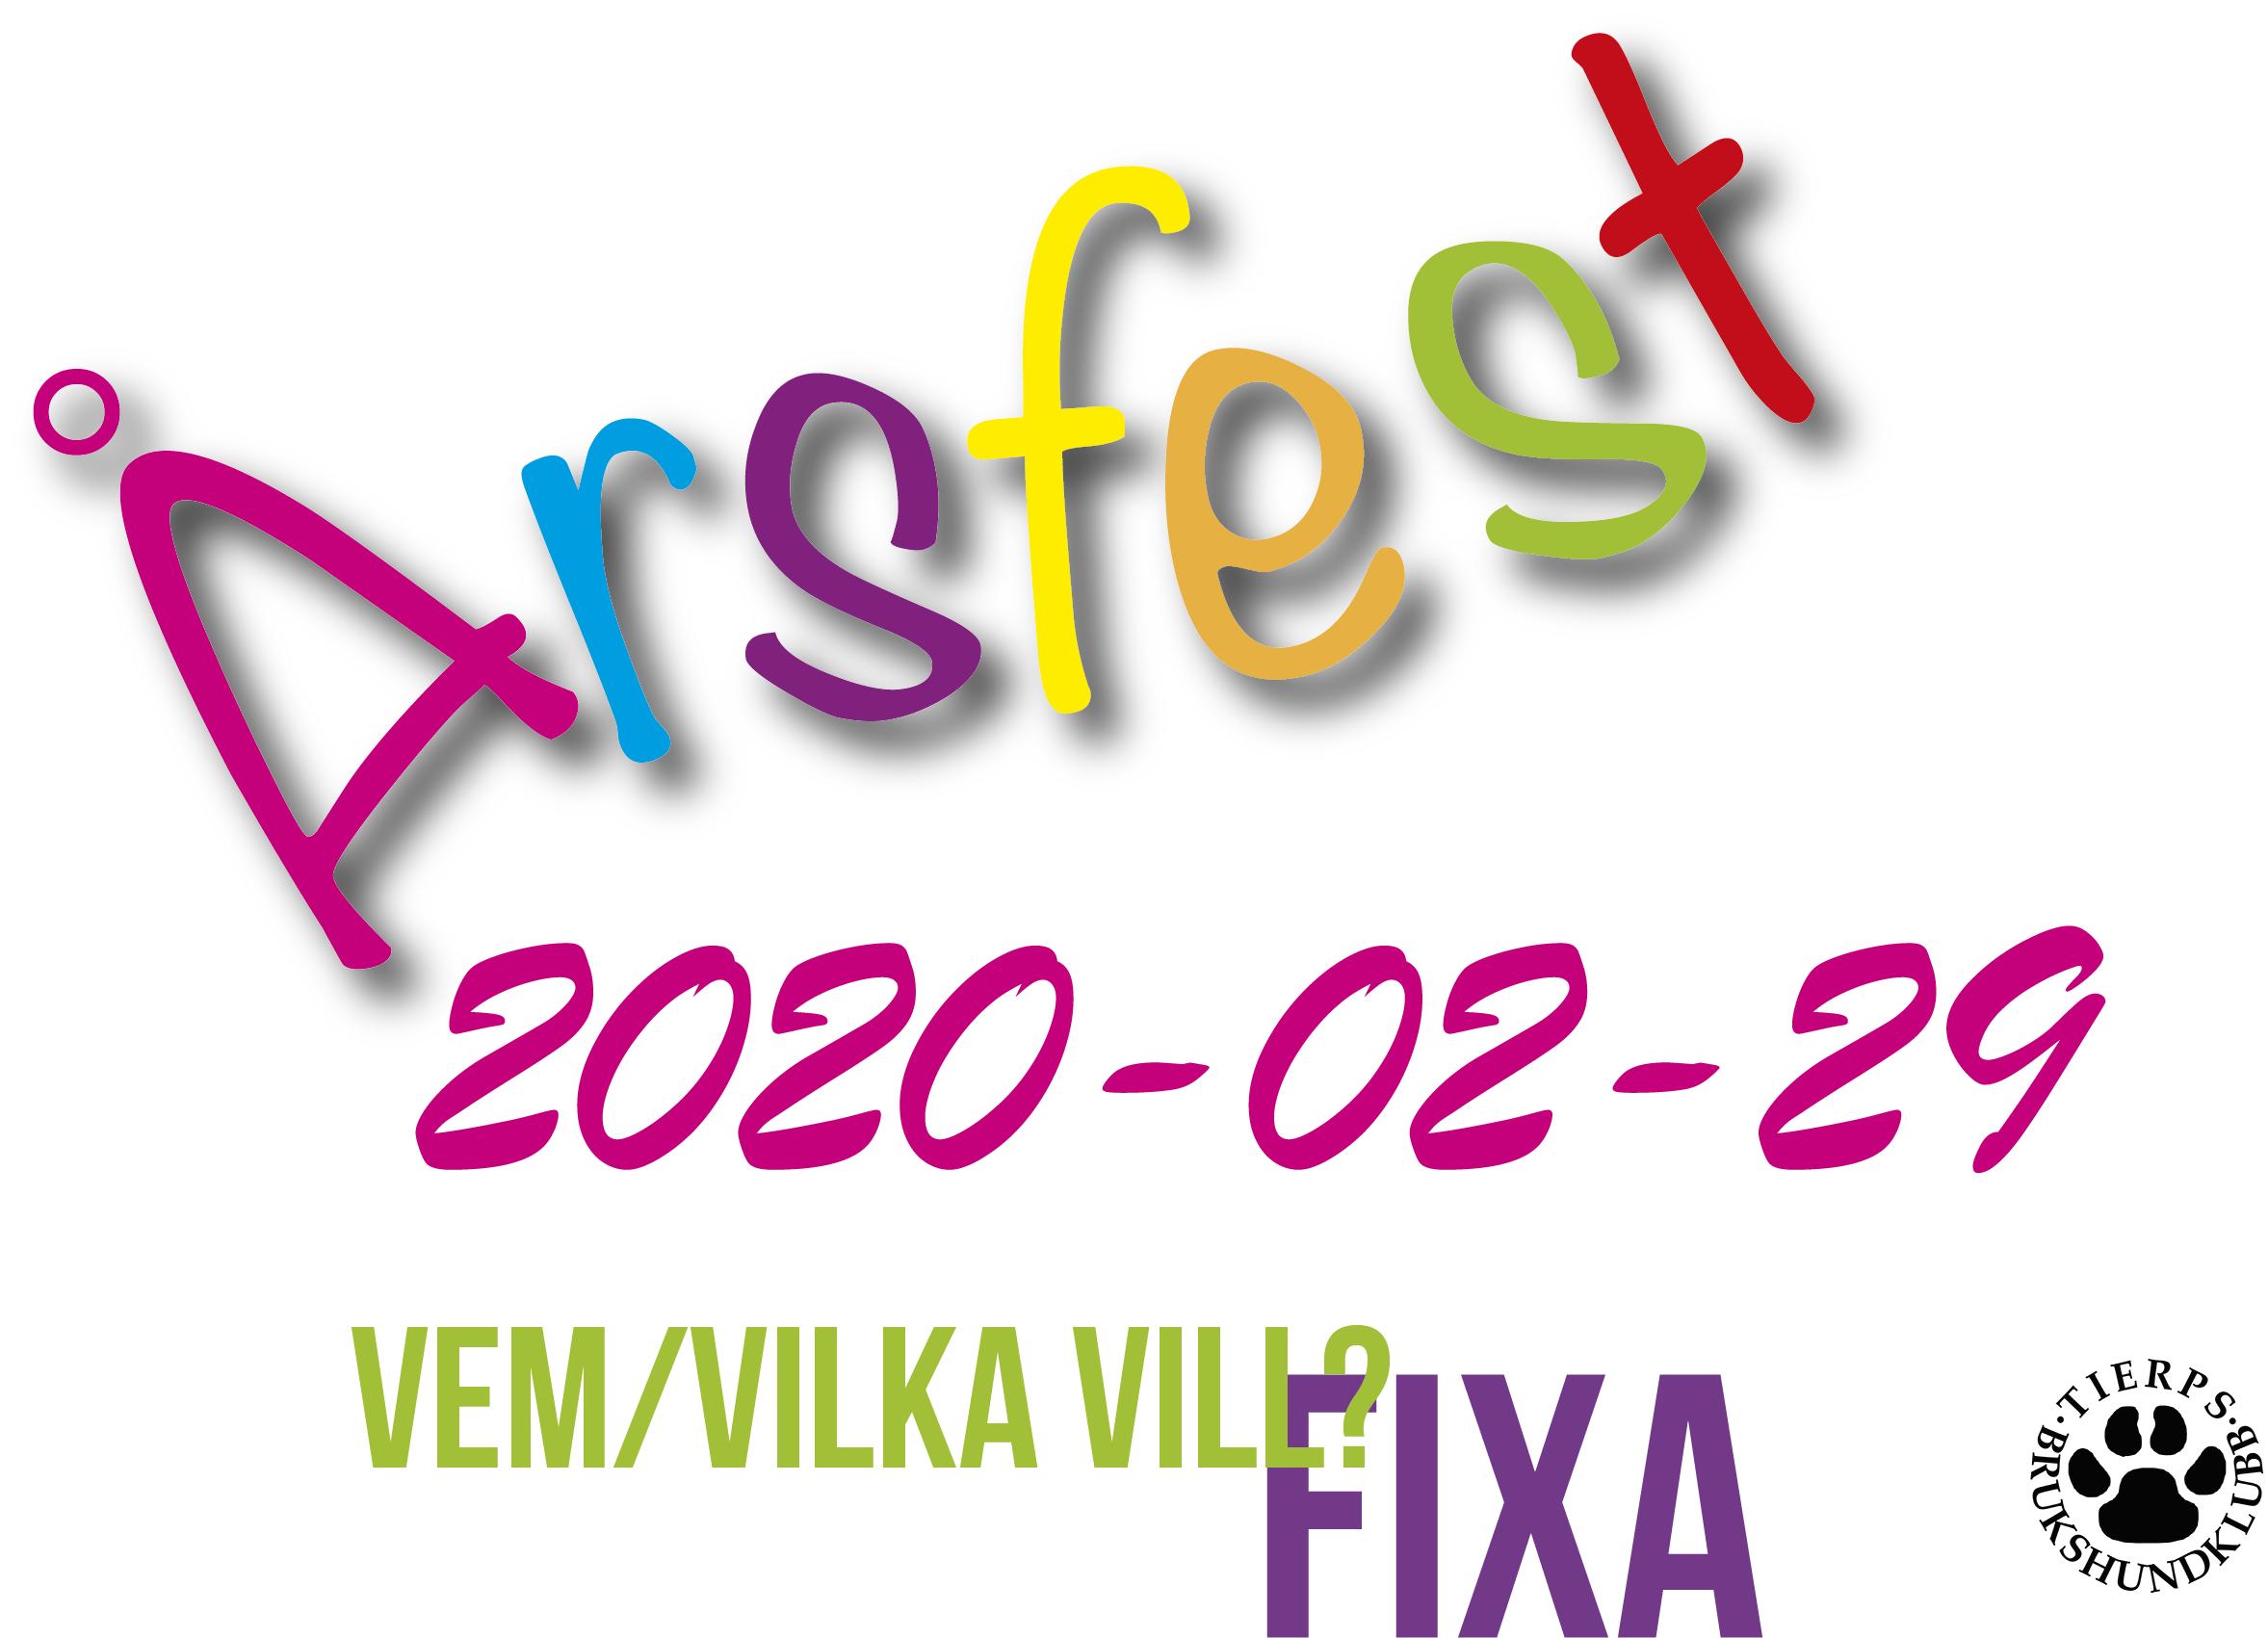 Årsfest 2020